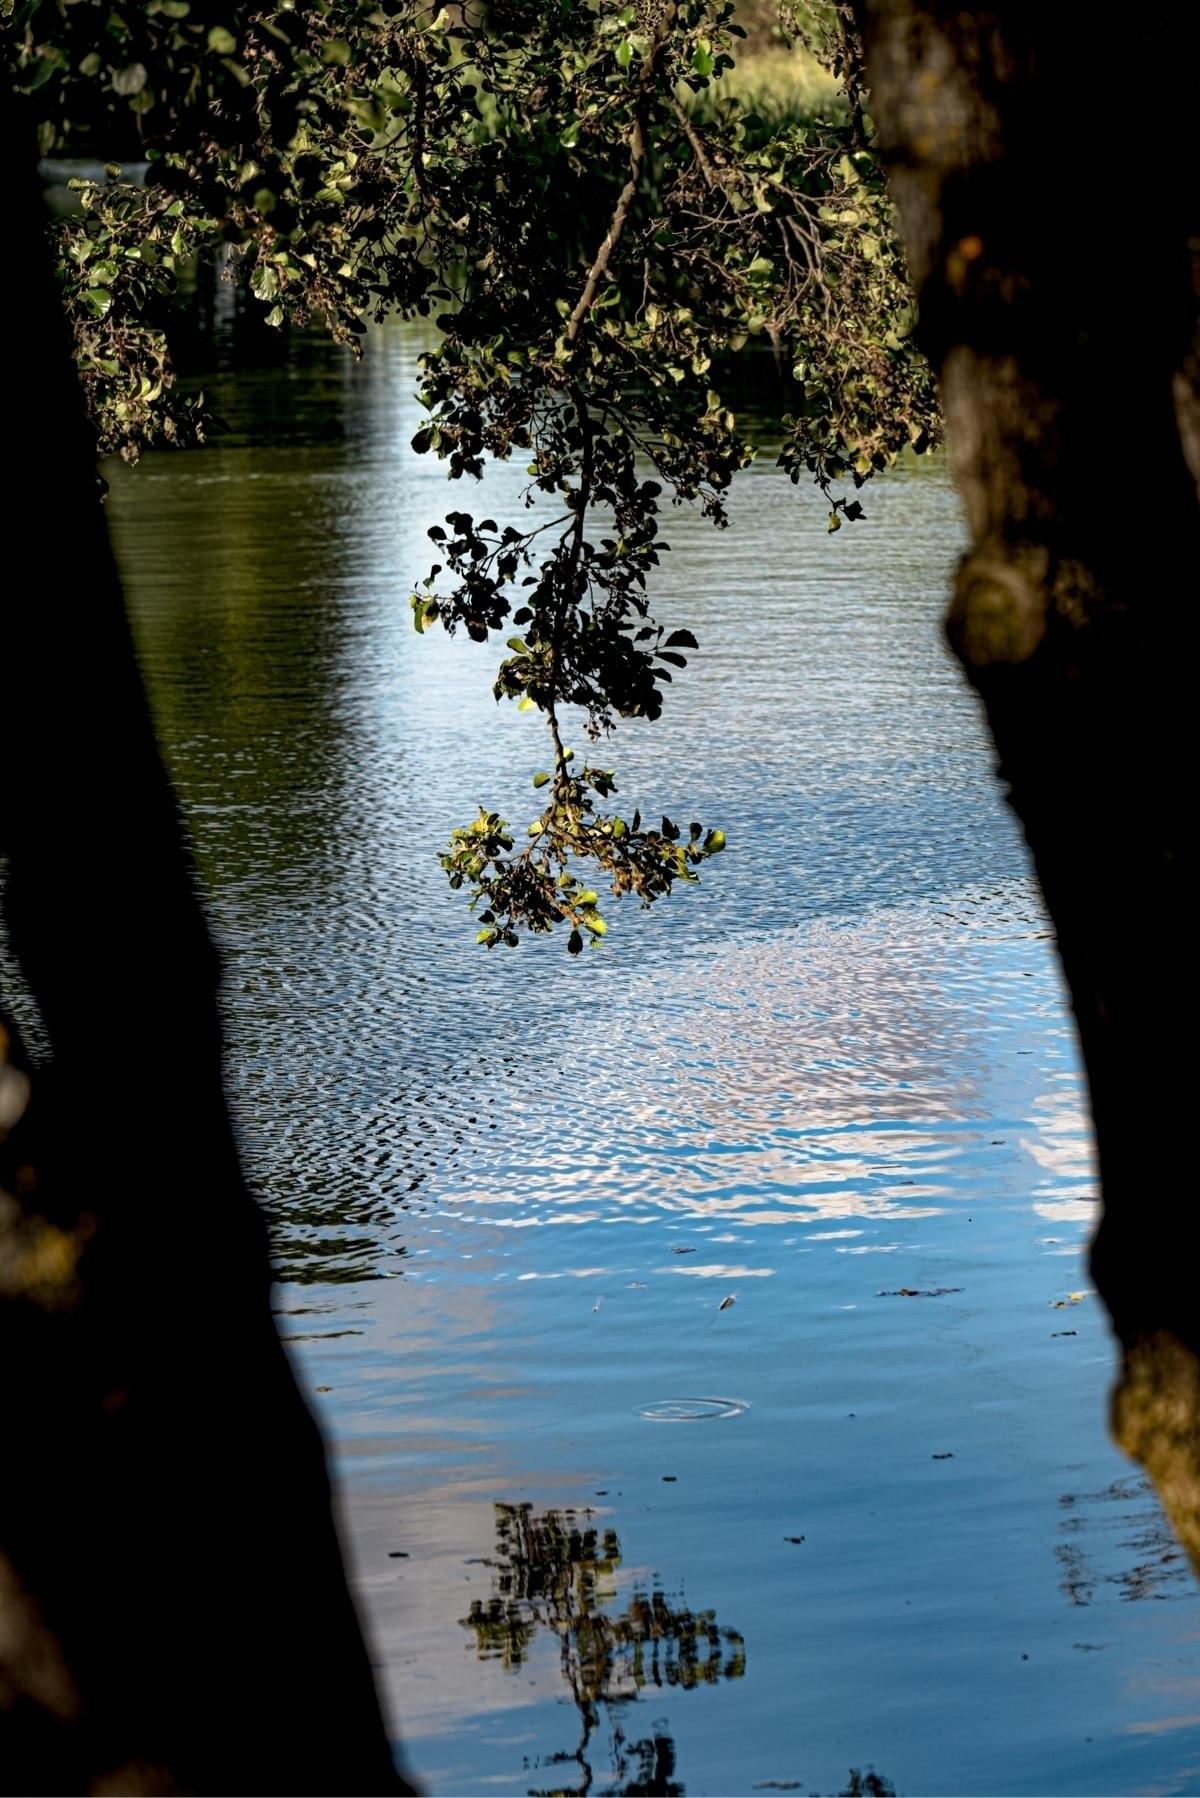 ello, nature, europe, travelphotography - photocharly046 | ello